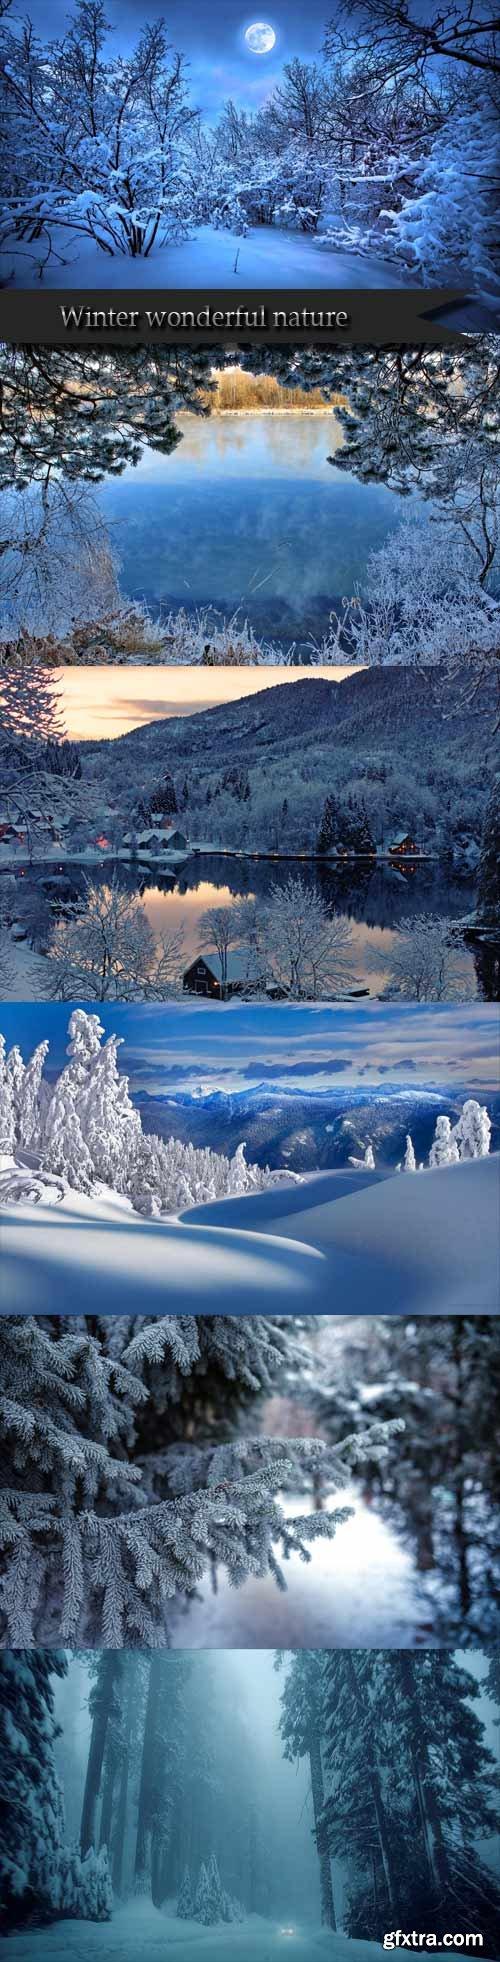 Winter wonderful nature